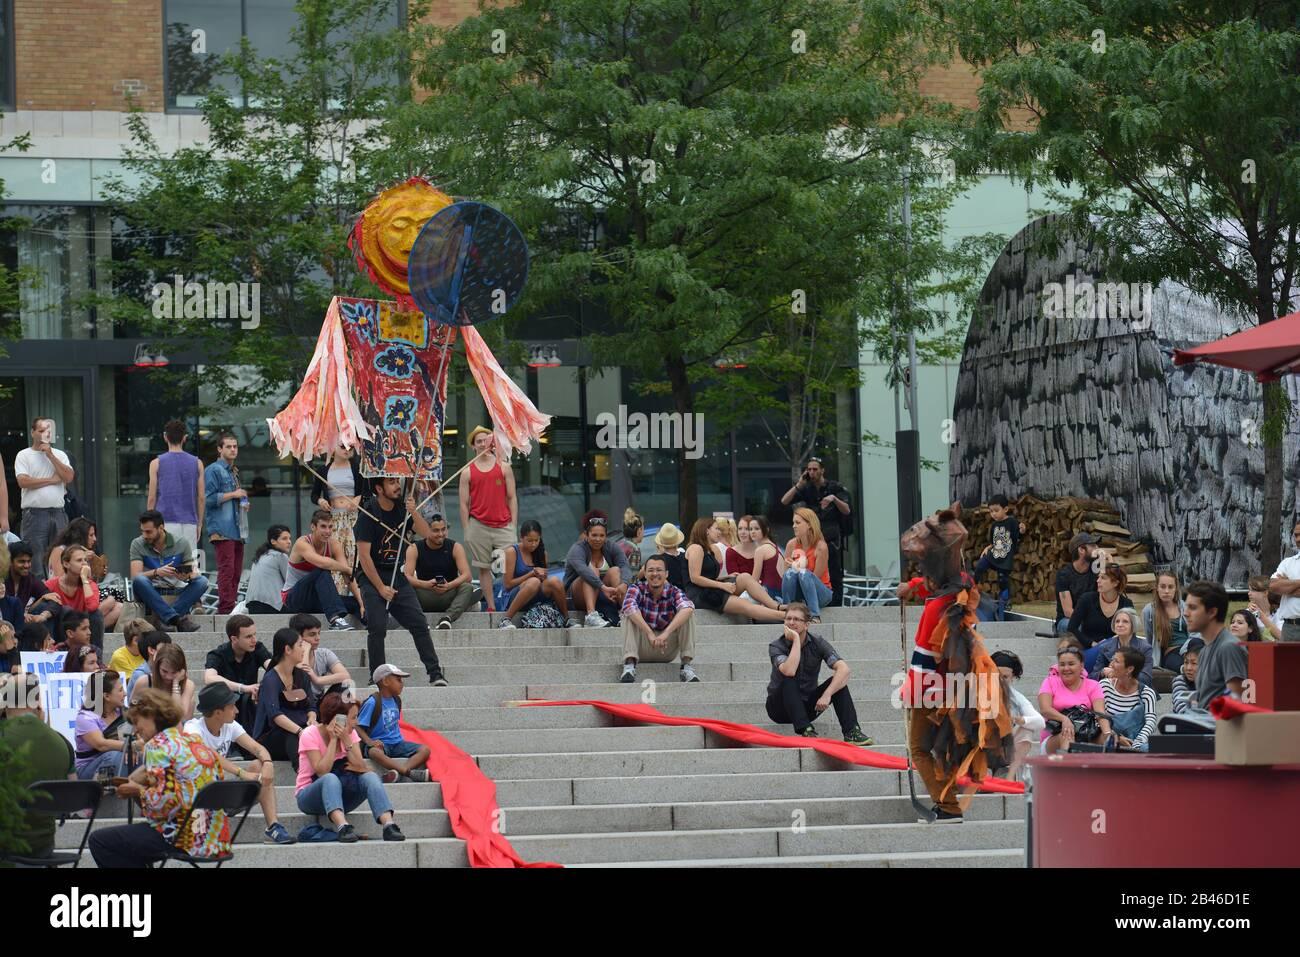 Strassenkunst, Place des Arts, Montreal, Quebec, Kanada Stock Photo